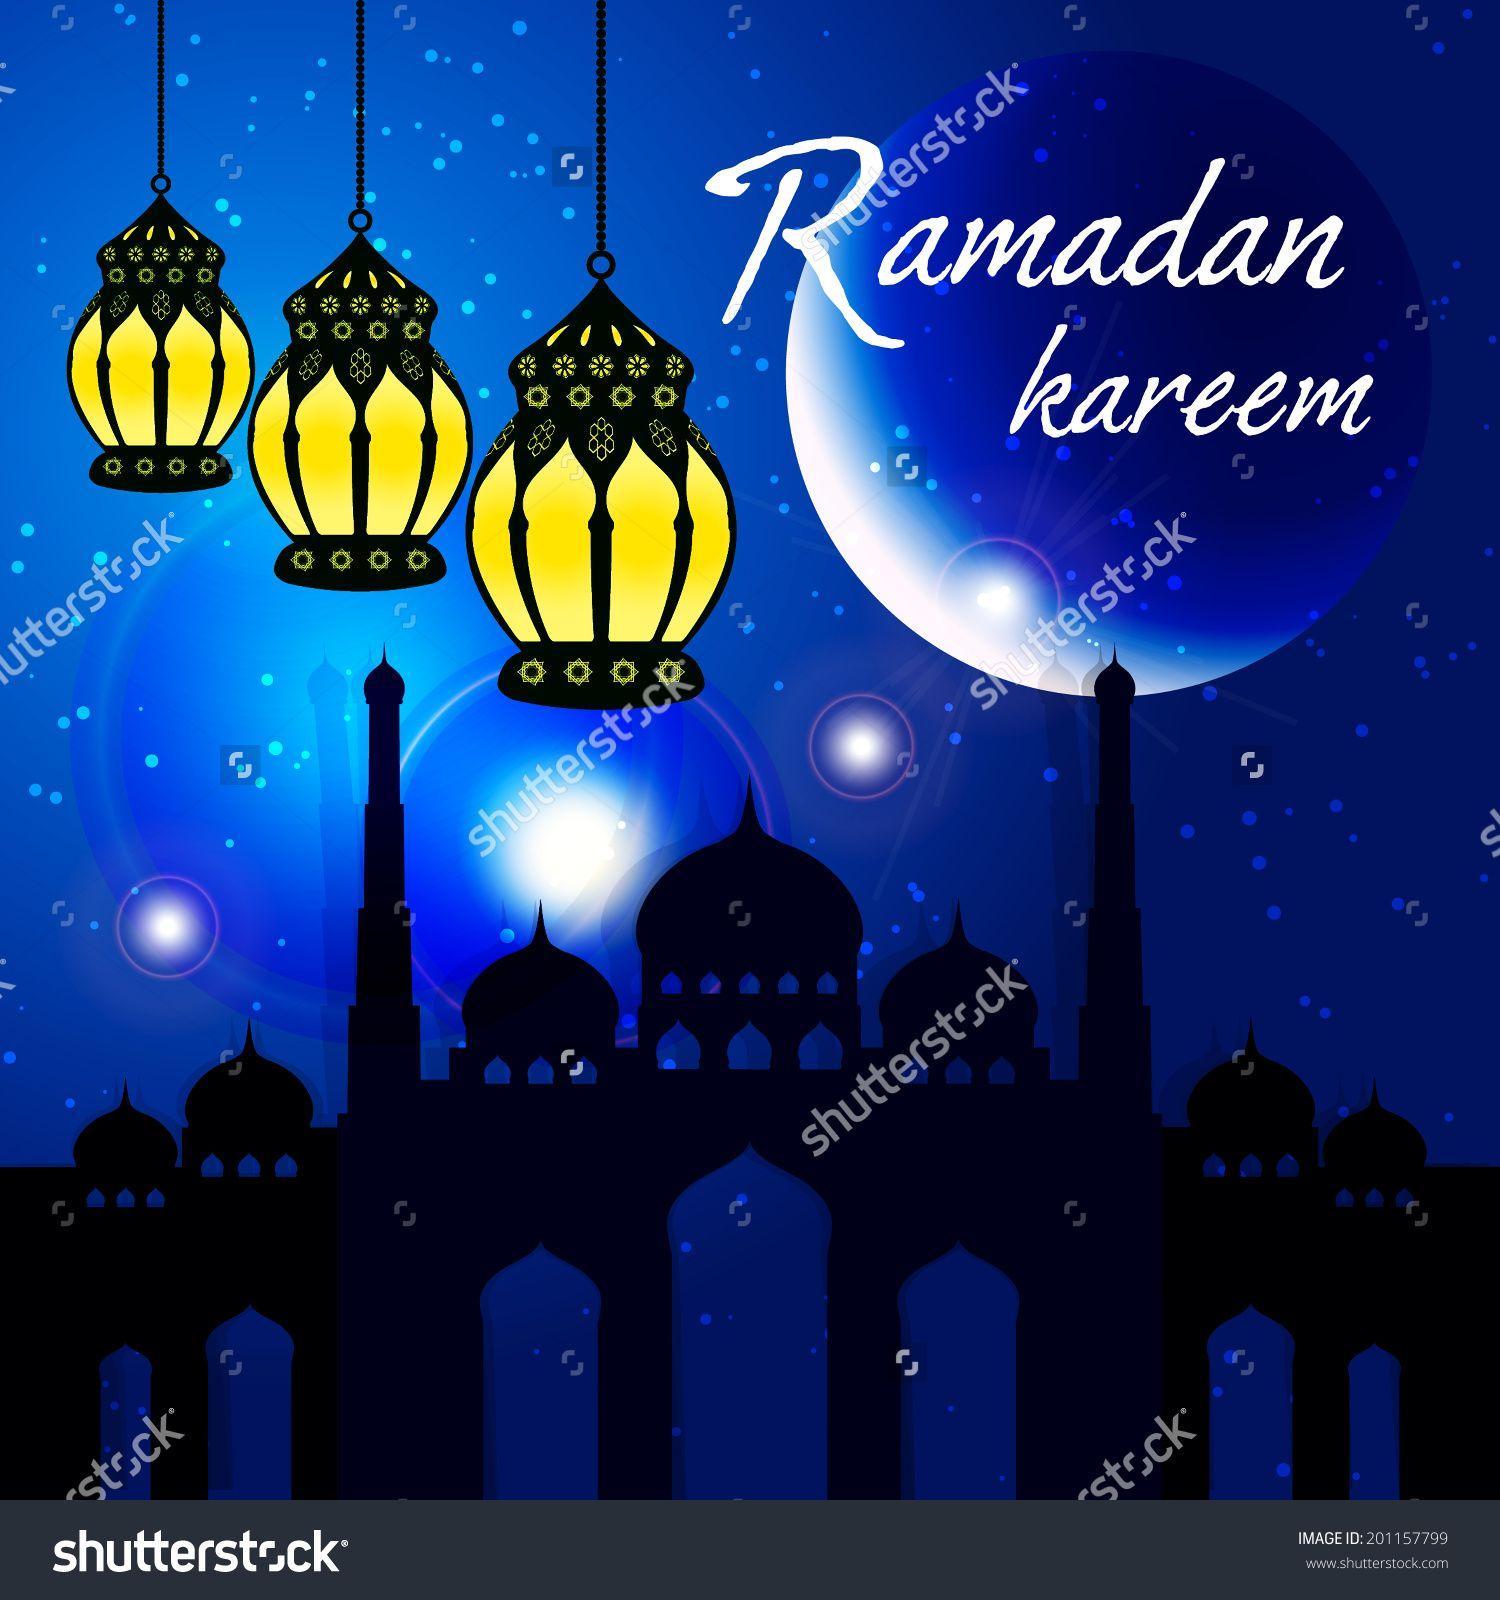 Ramadan Kareem Greeting Card Vector Template Greeting Card With